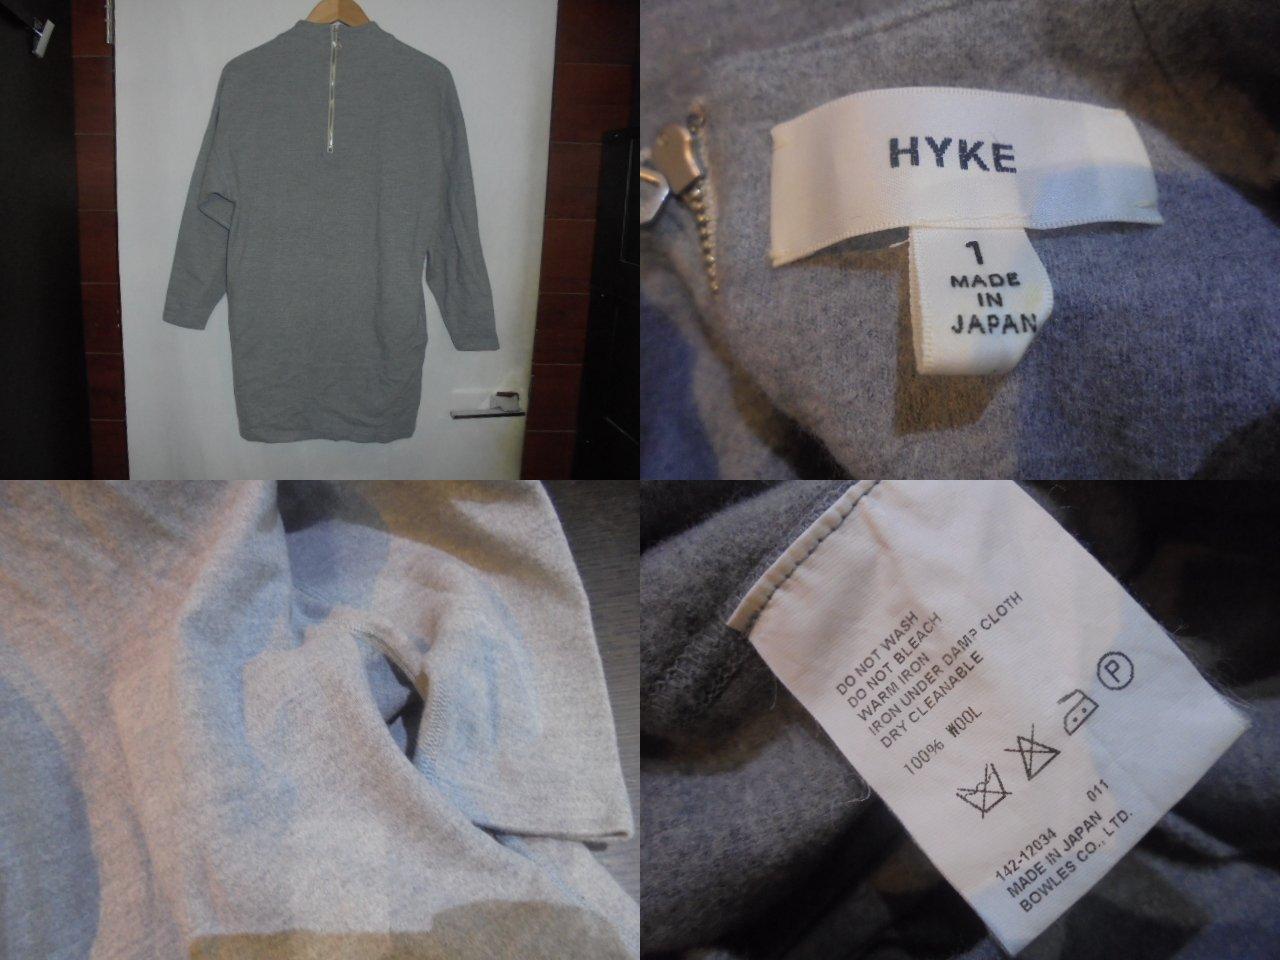 HYKE ハイクL/S バックジップ.ウールワンピース[GRAY] サイズ1ブランド古着【中古】